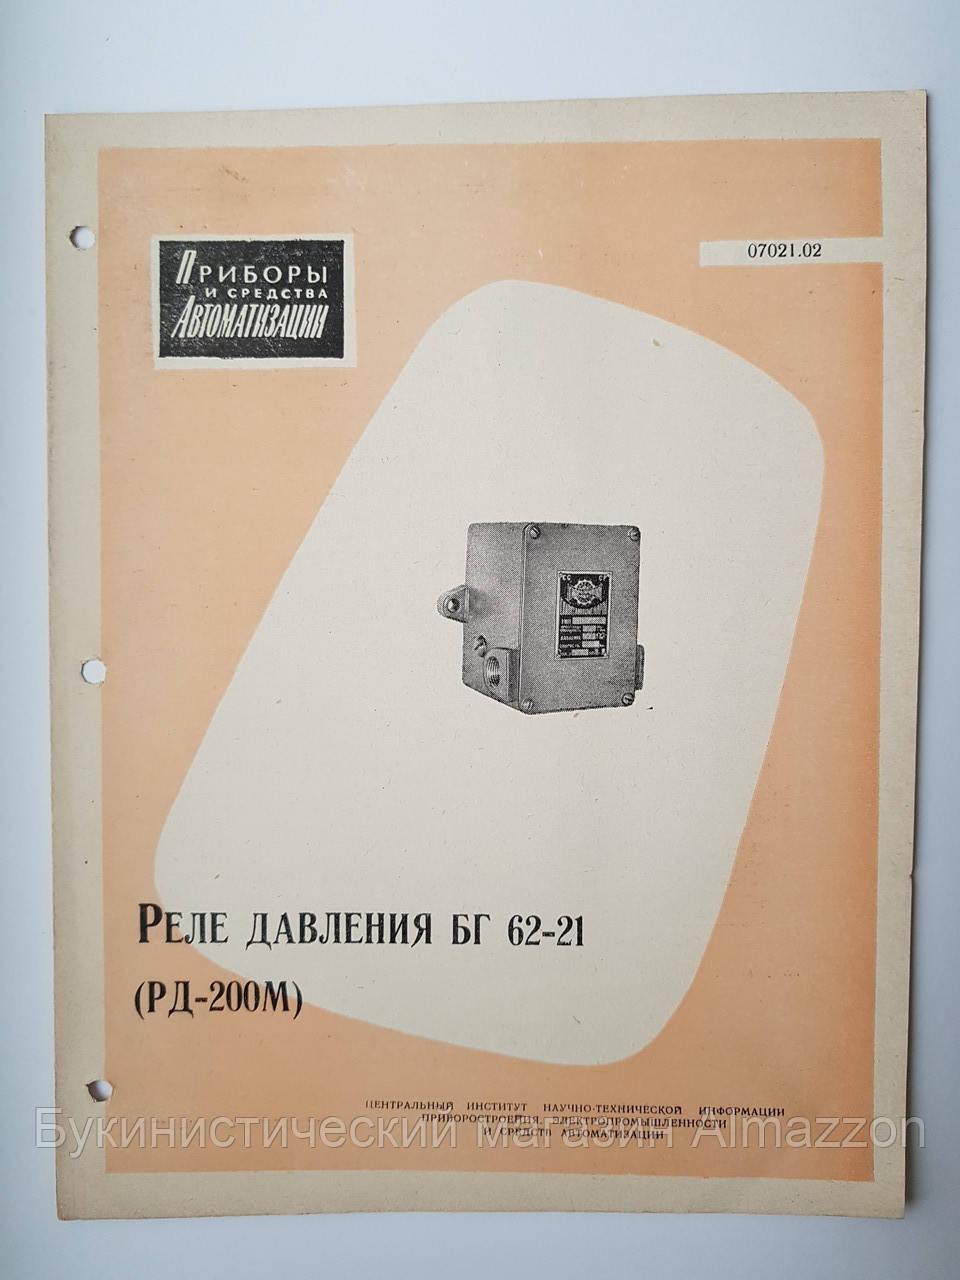 "Журнал (Бюллетень) ""Реле давления БГ 62-21 (РД-200М)  07021.02"" 1963 г."